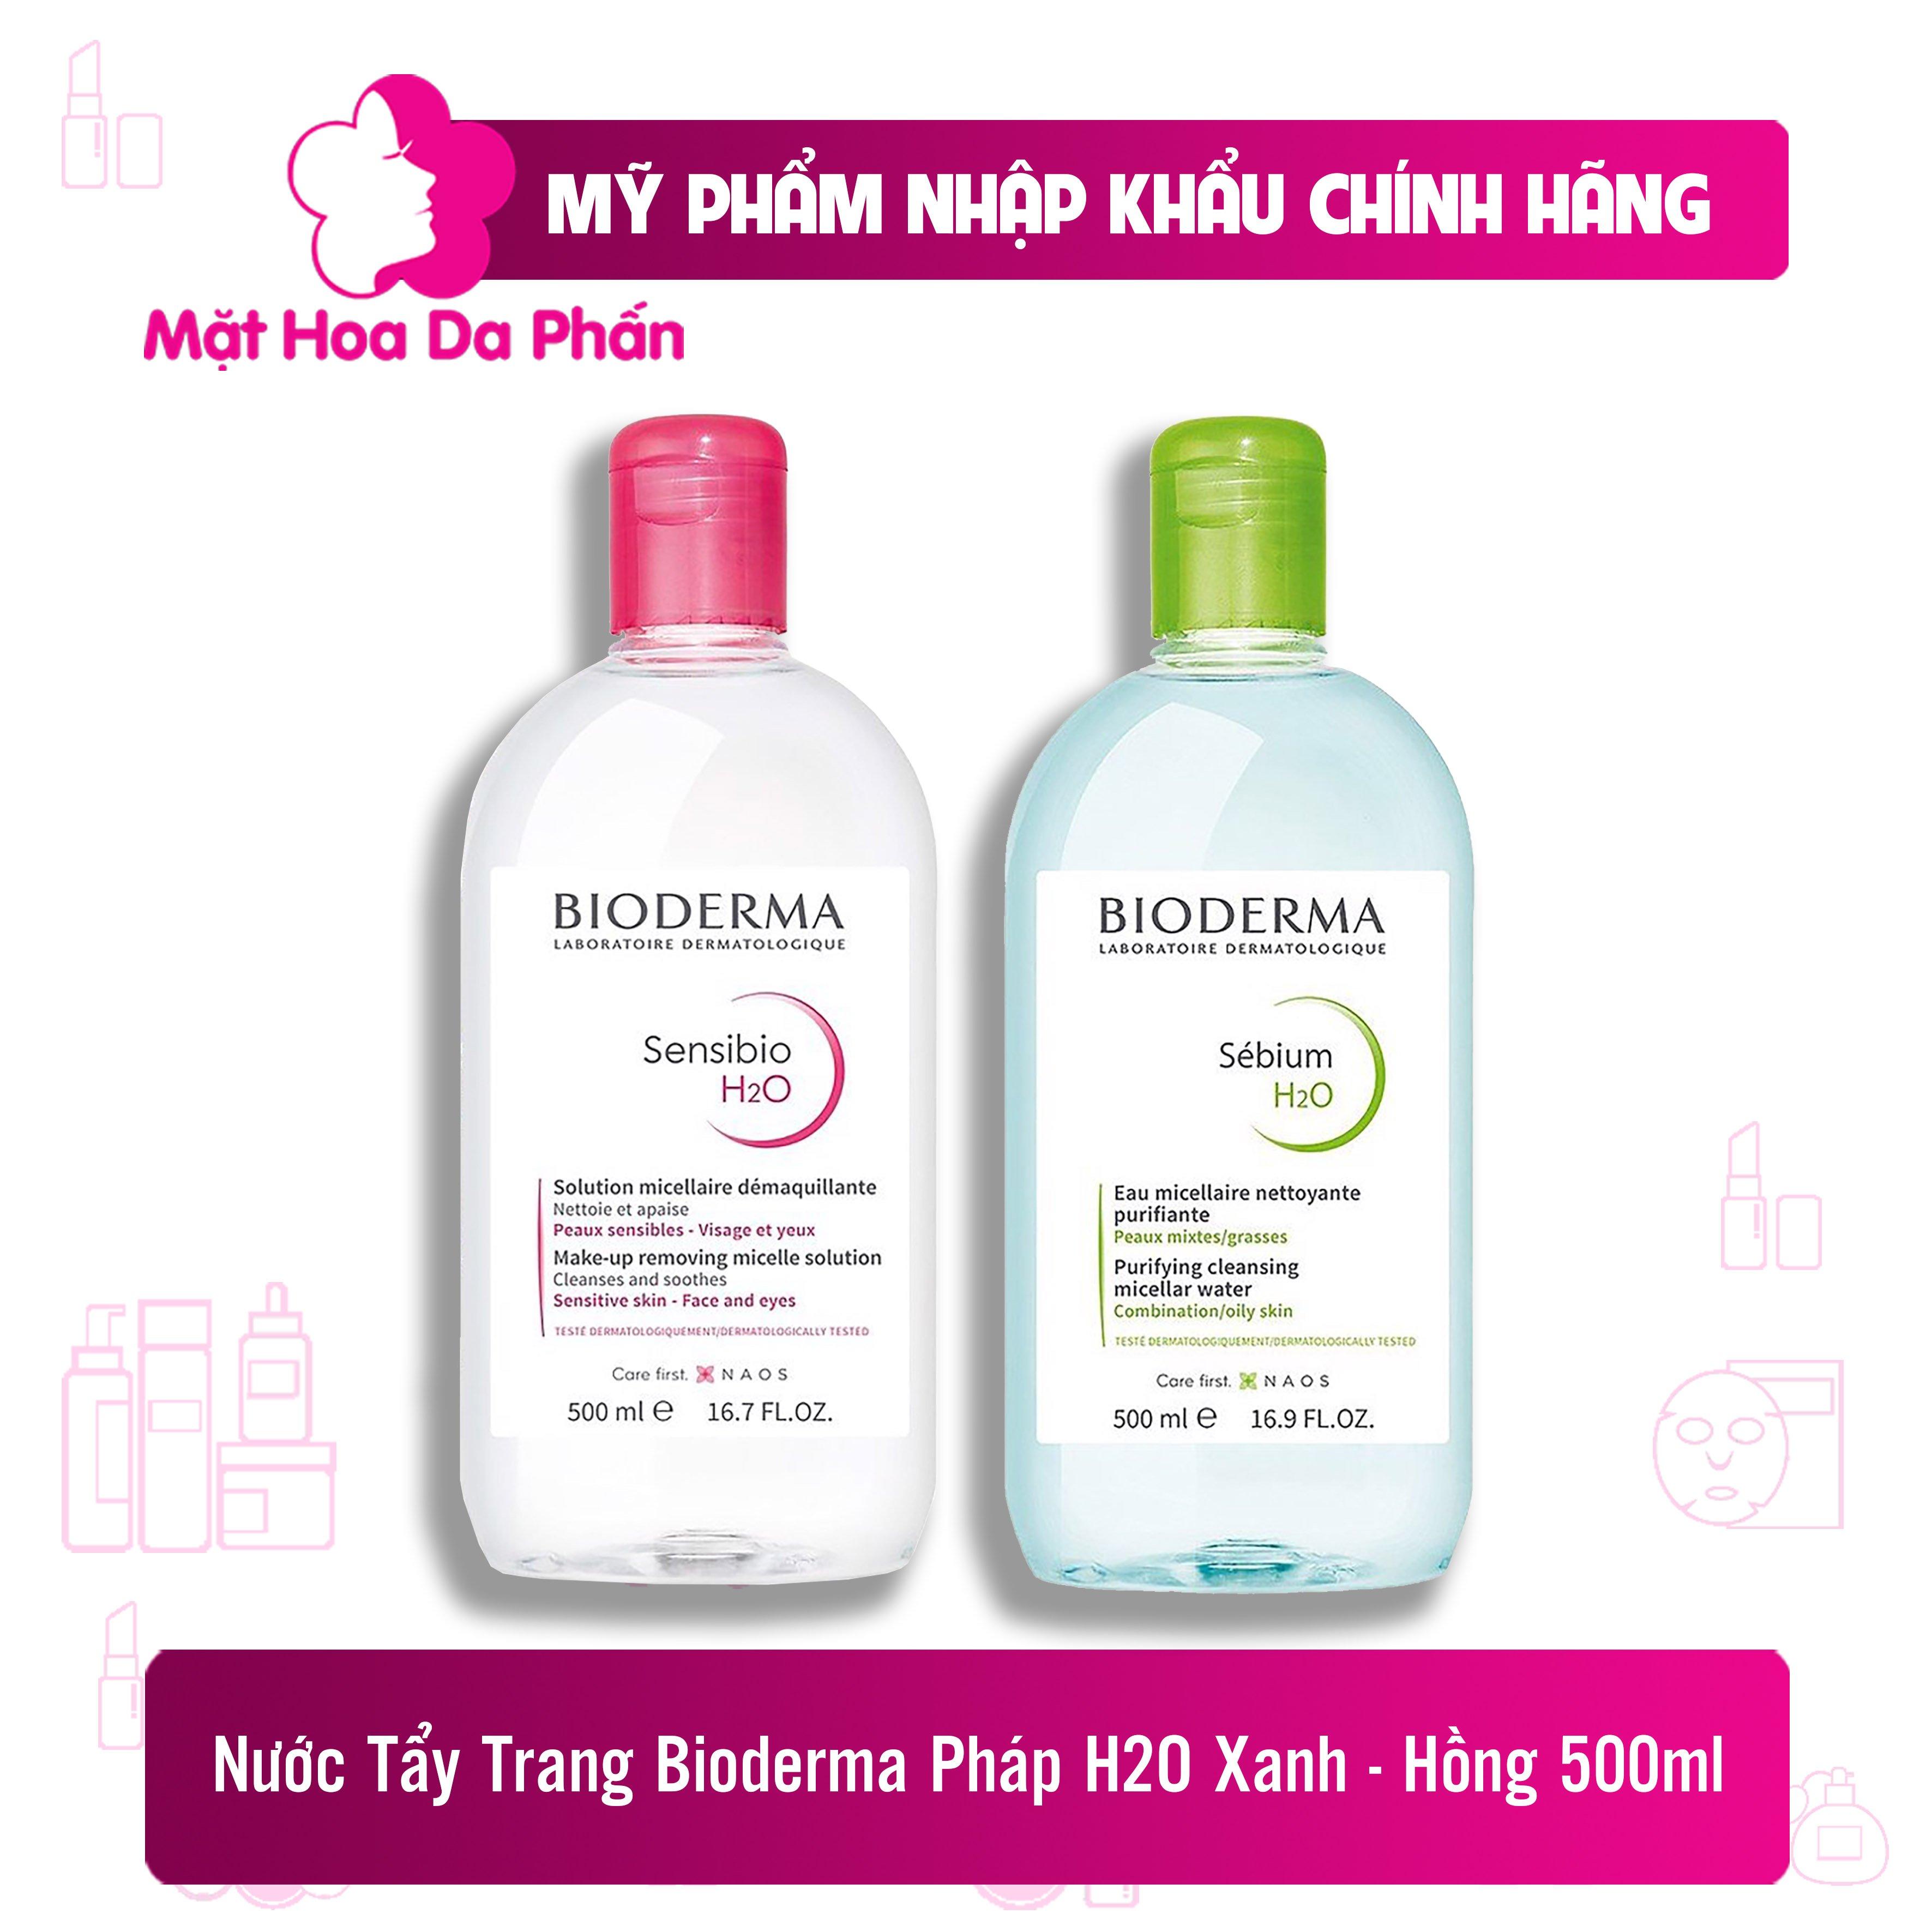 Tẩy Trang Bioderma Sensibio H2O Hồng 500ml